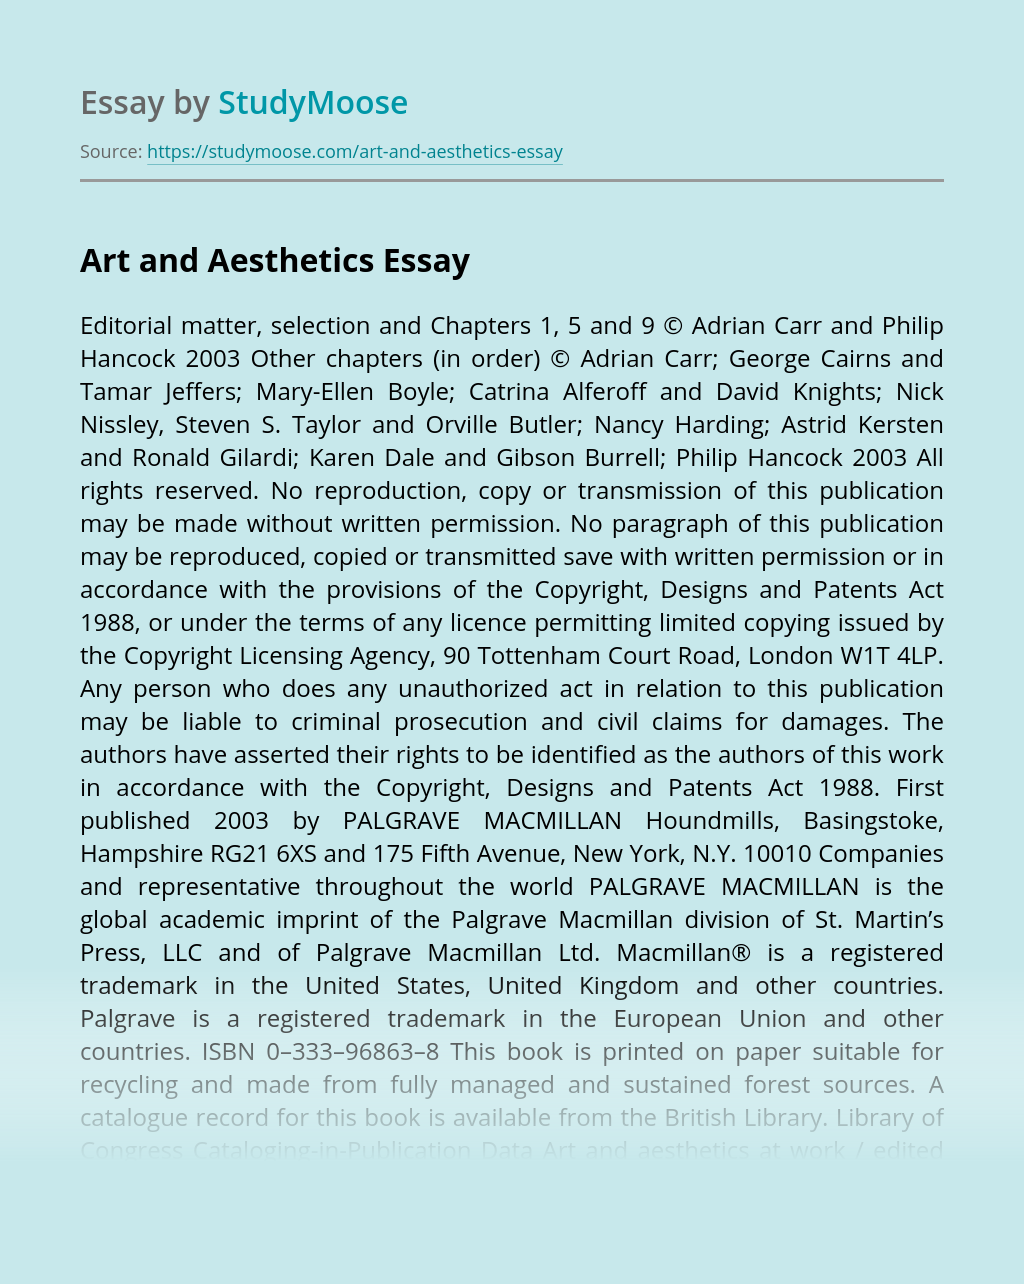 Art and Aesthetics